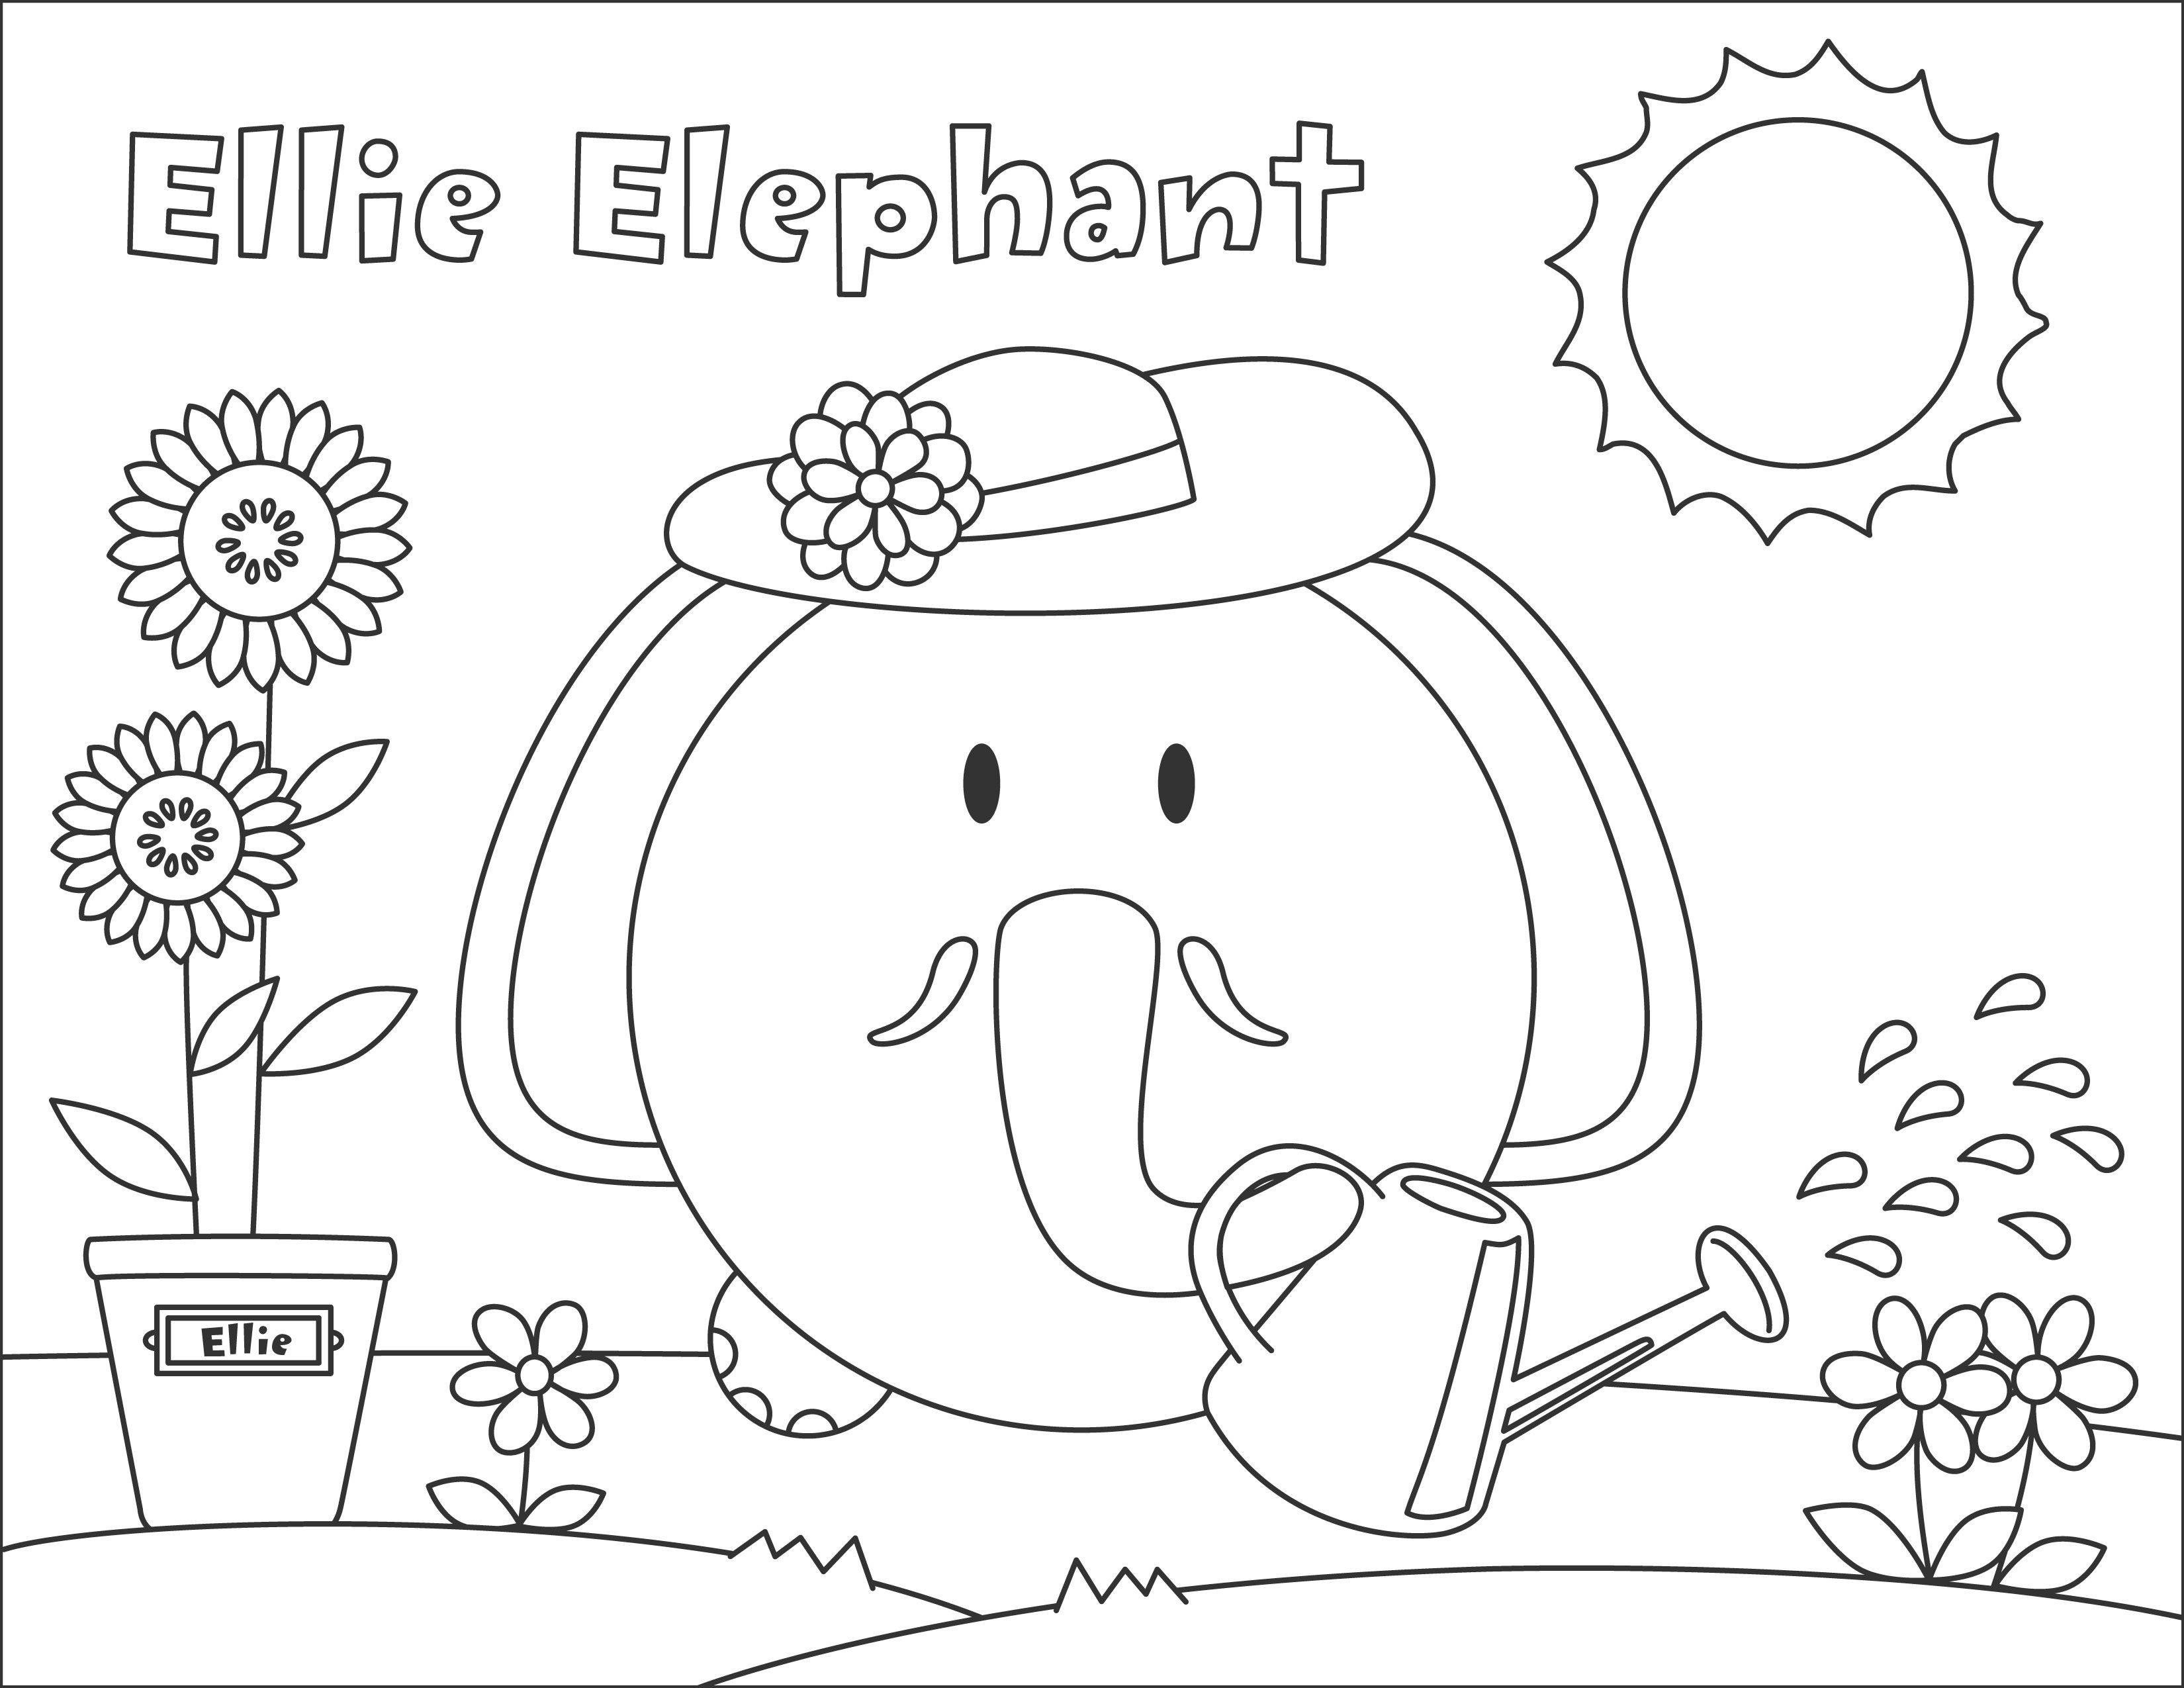 Ellie Elephant #bumpidoodle coloring page #coloringpage